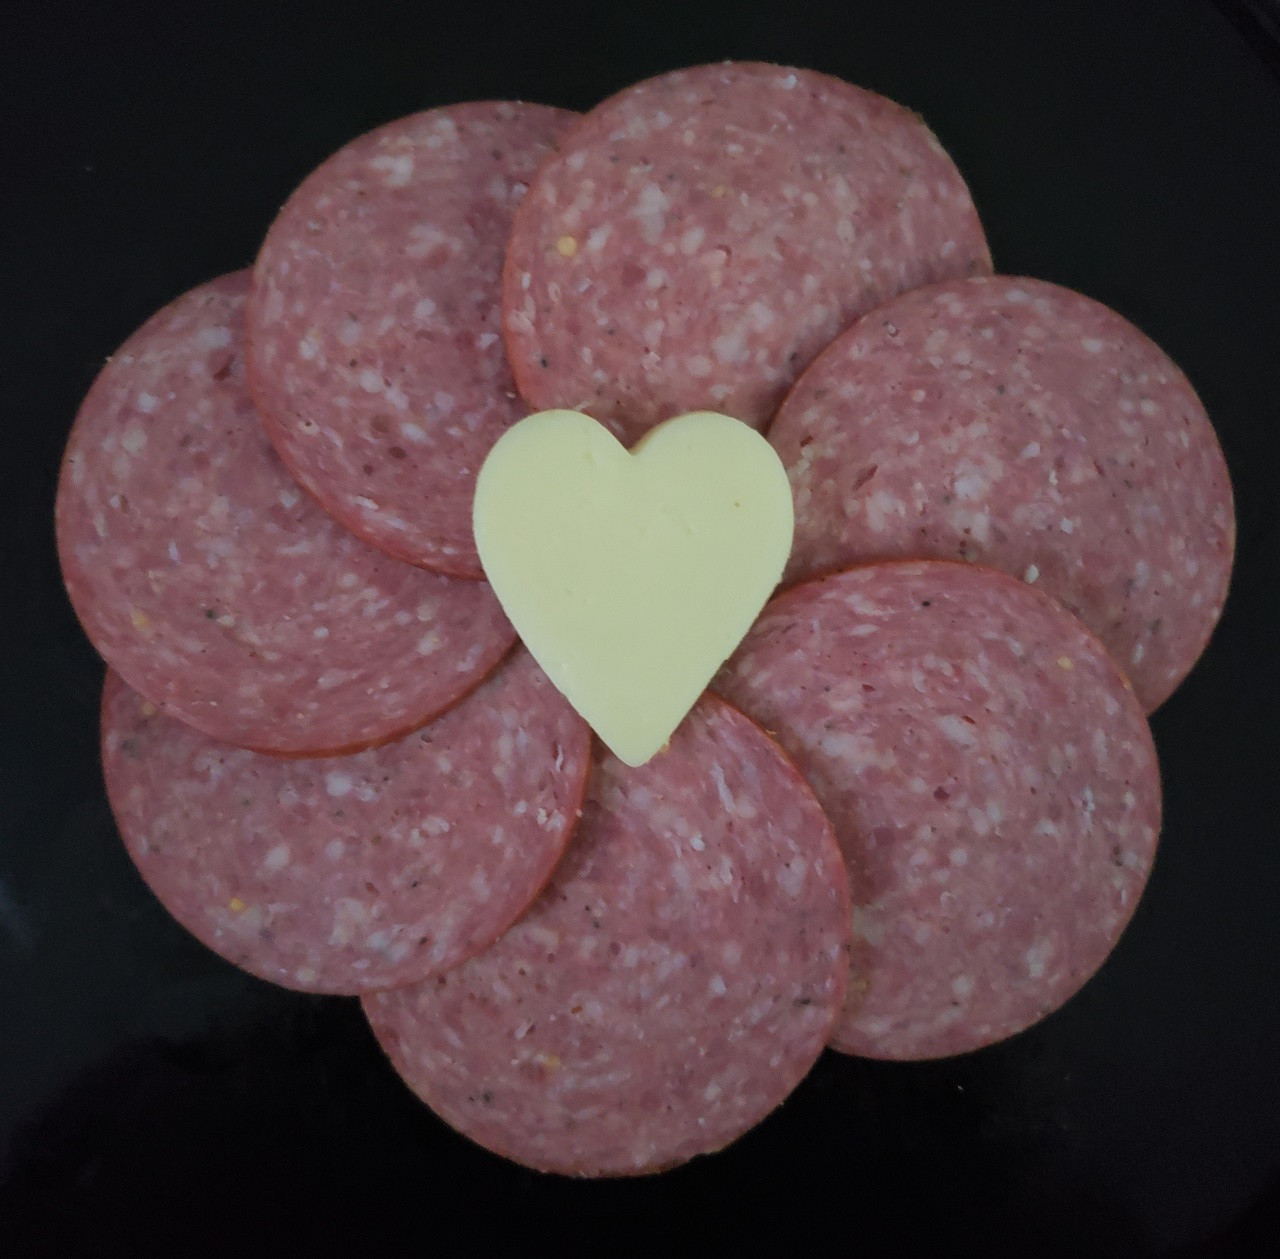 Silver Creek Venison Summer Sausage with pork & beef  2 lbs.